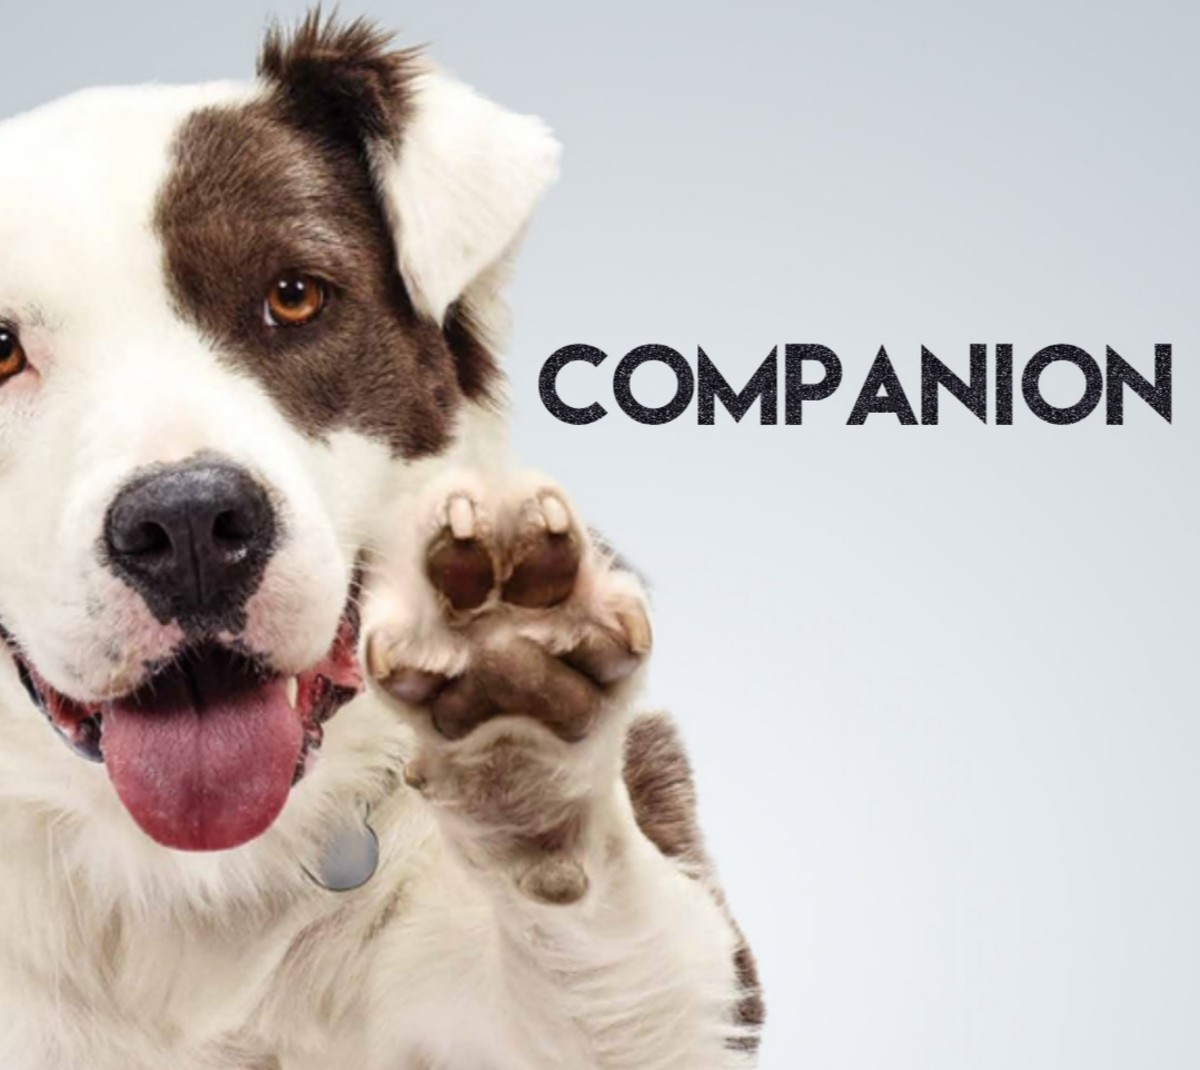 Companion (A Narrative Poem)